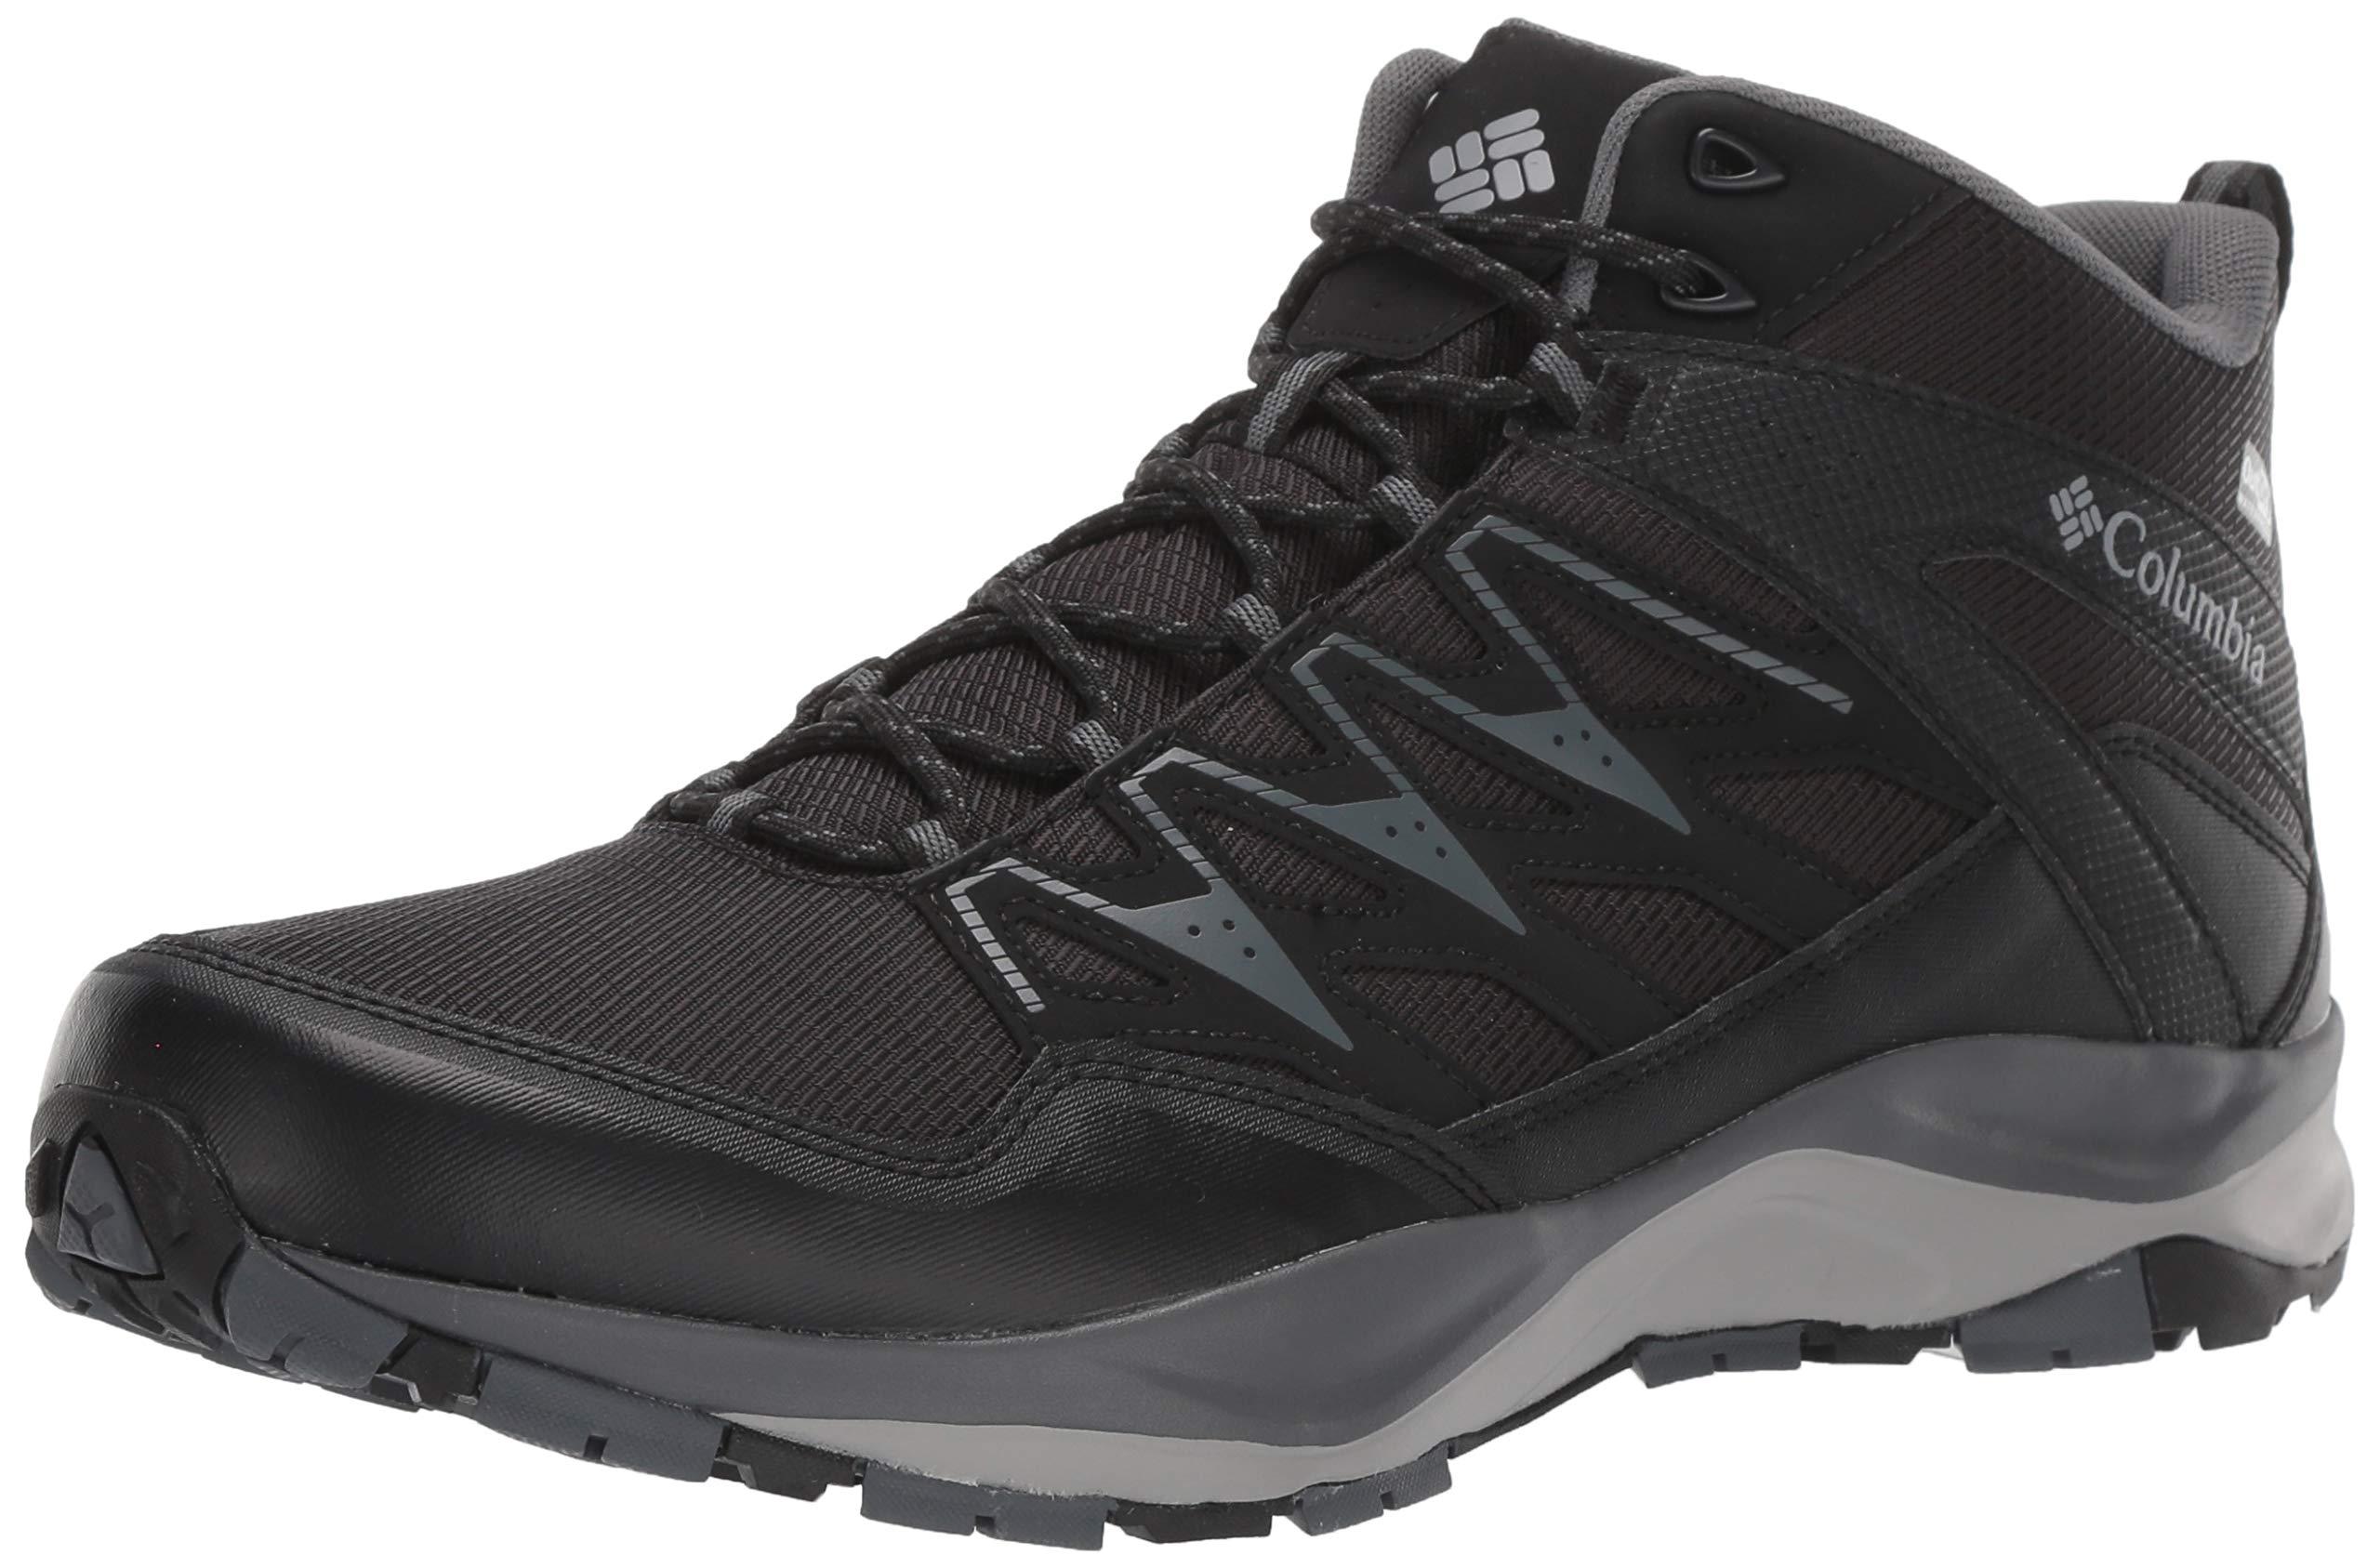 Columbia Men's WAYFINDER MID Outdry Hiking Shoe, Black, steam, 15 Regular US by Columbia